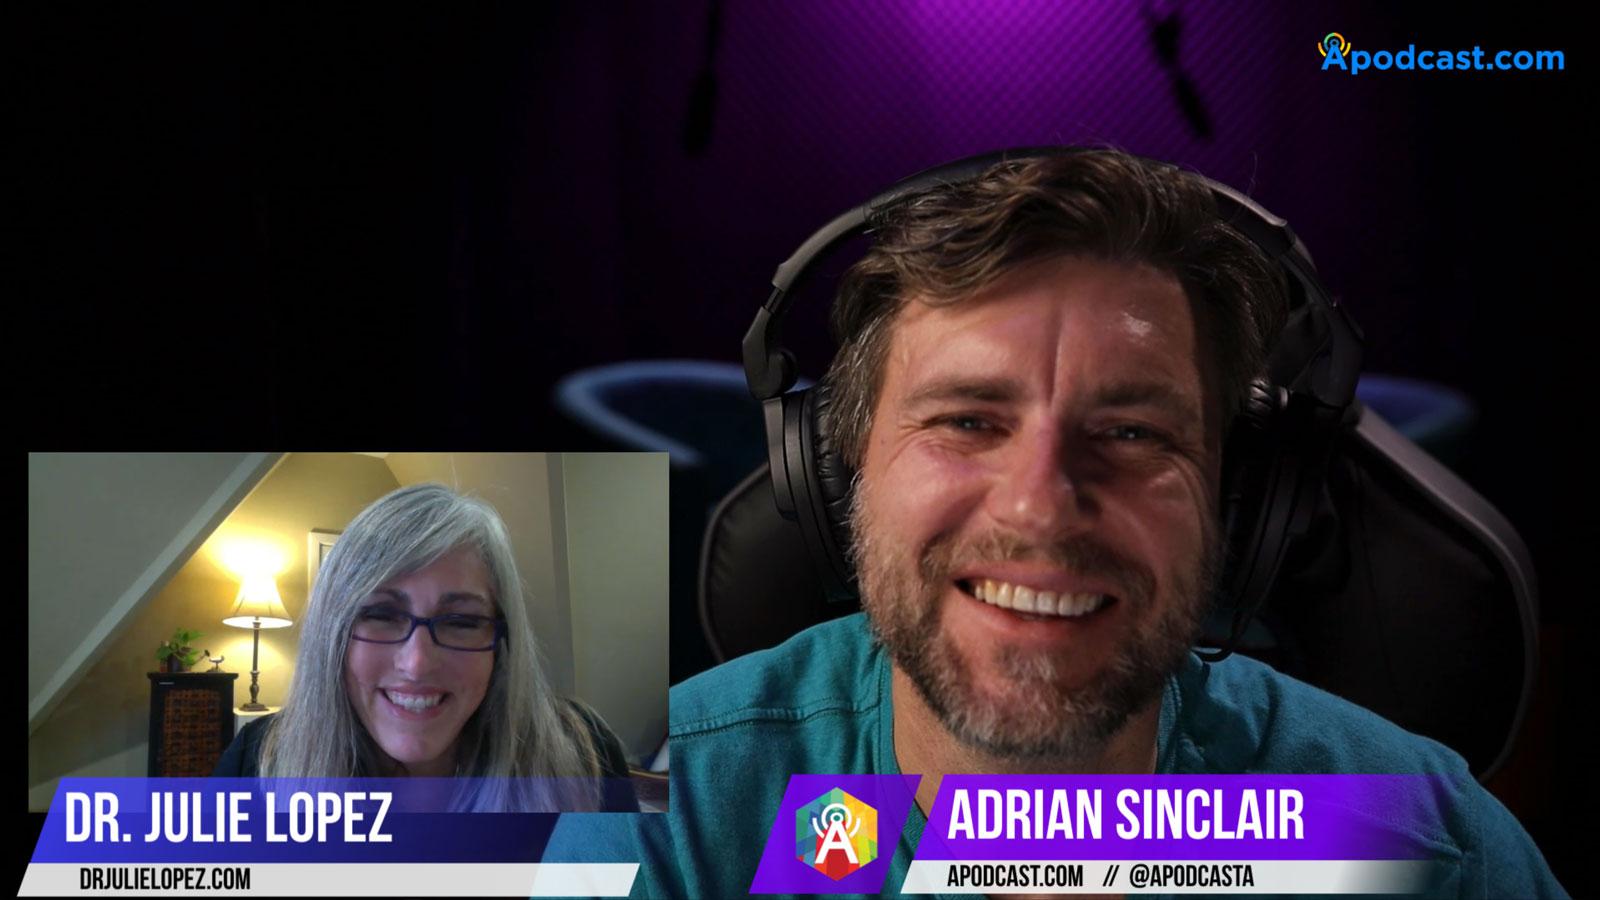 Dr. Julie Lopez with Adrian Sinclair